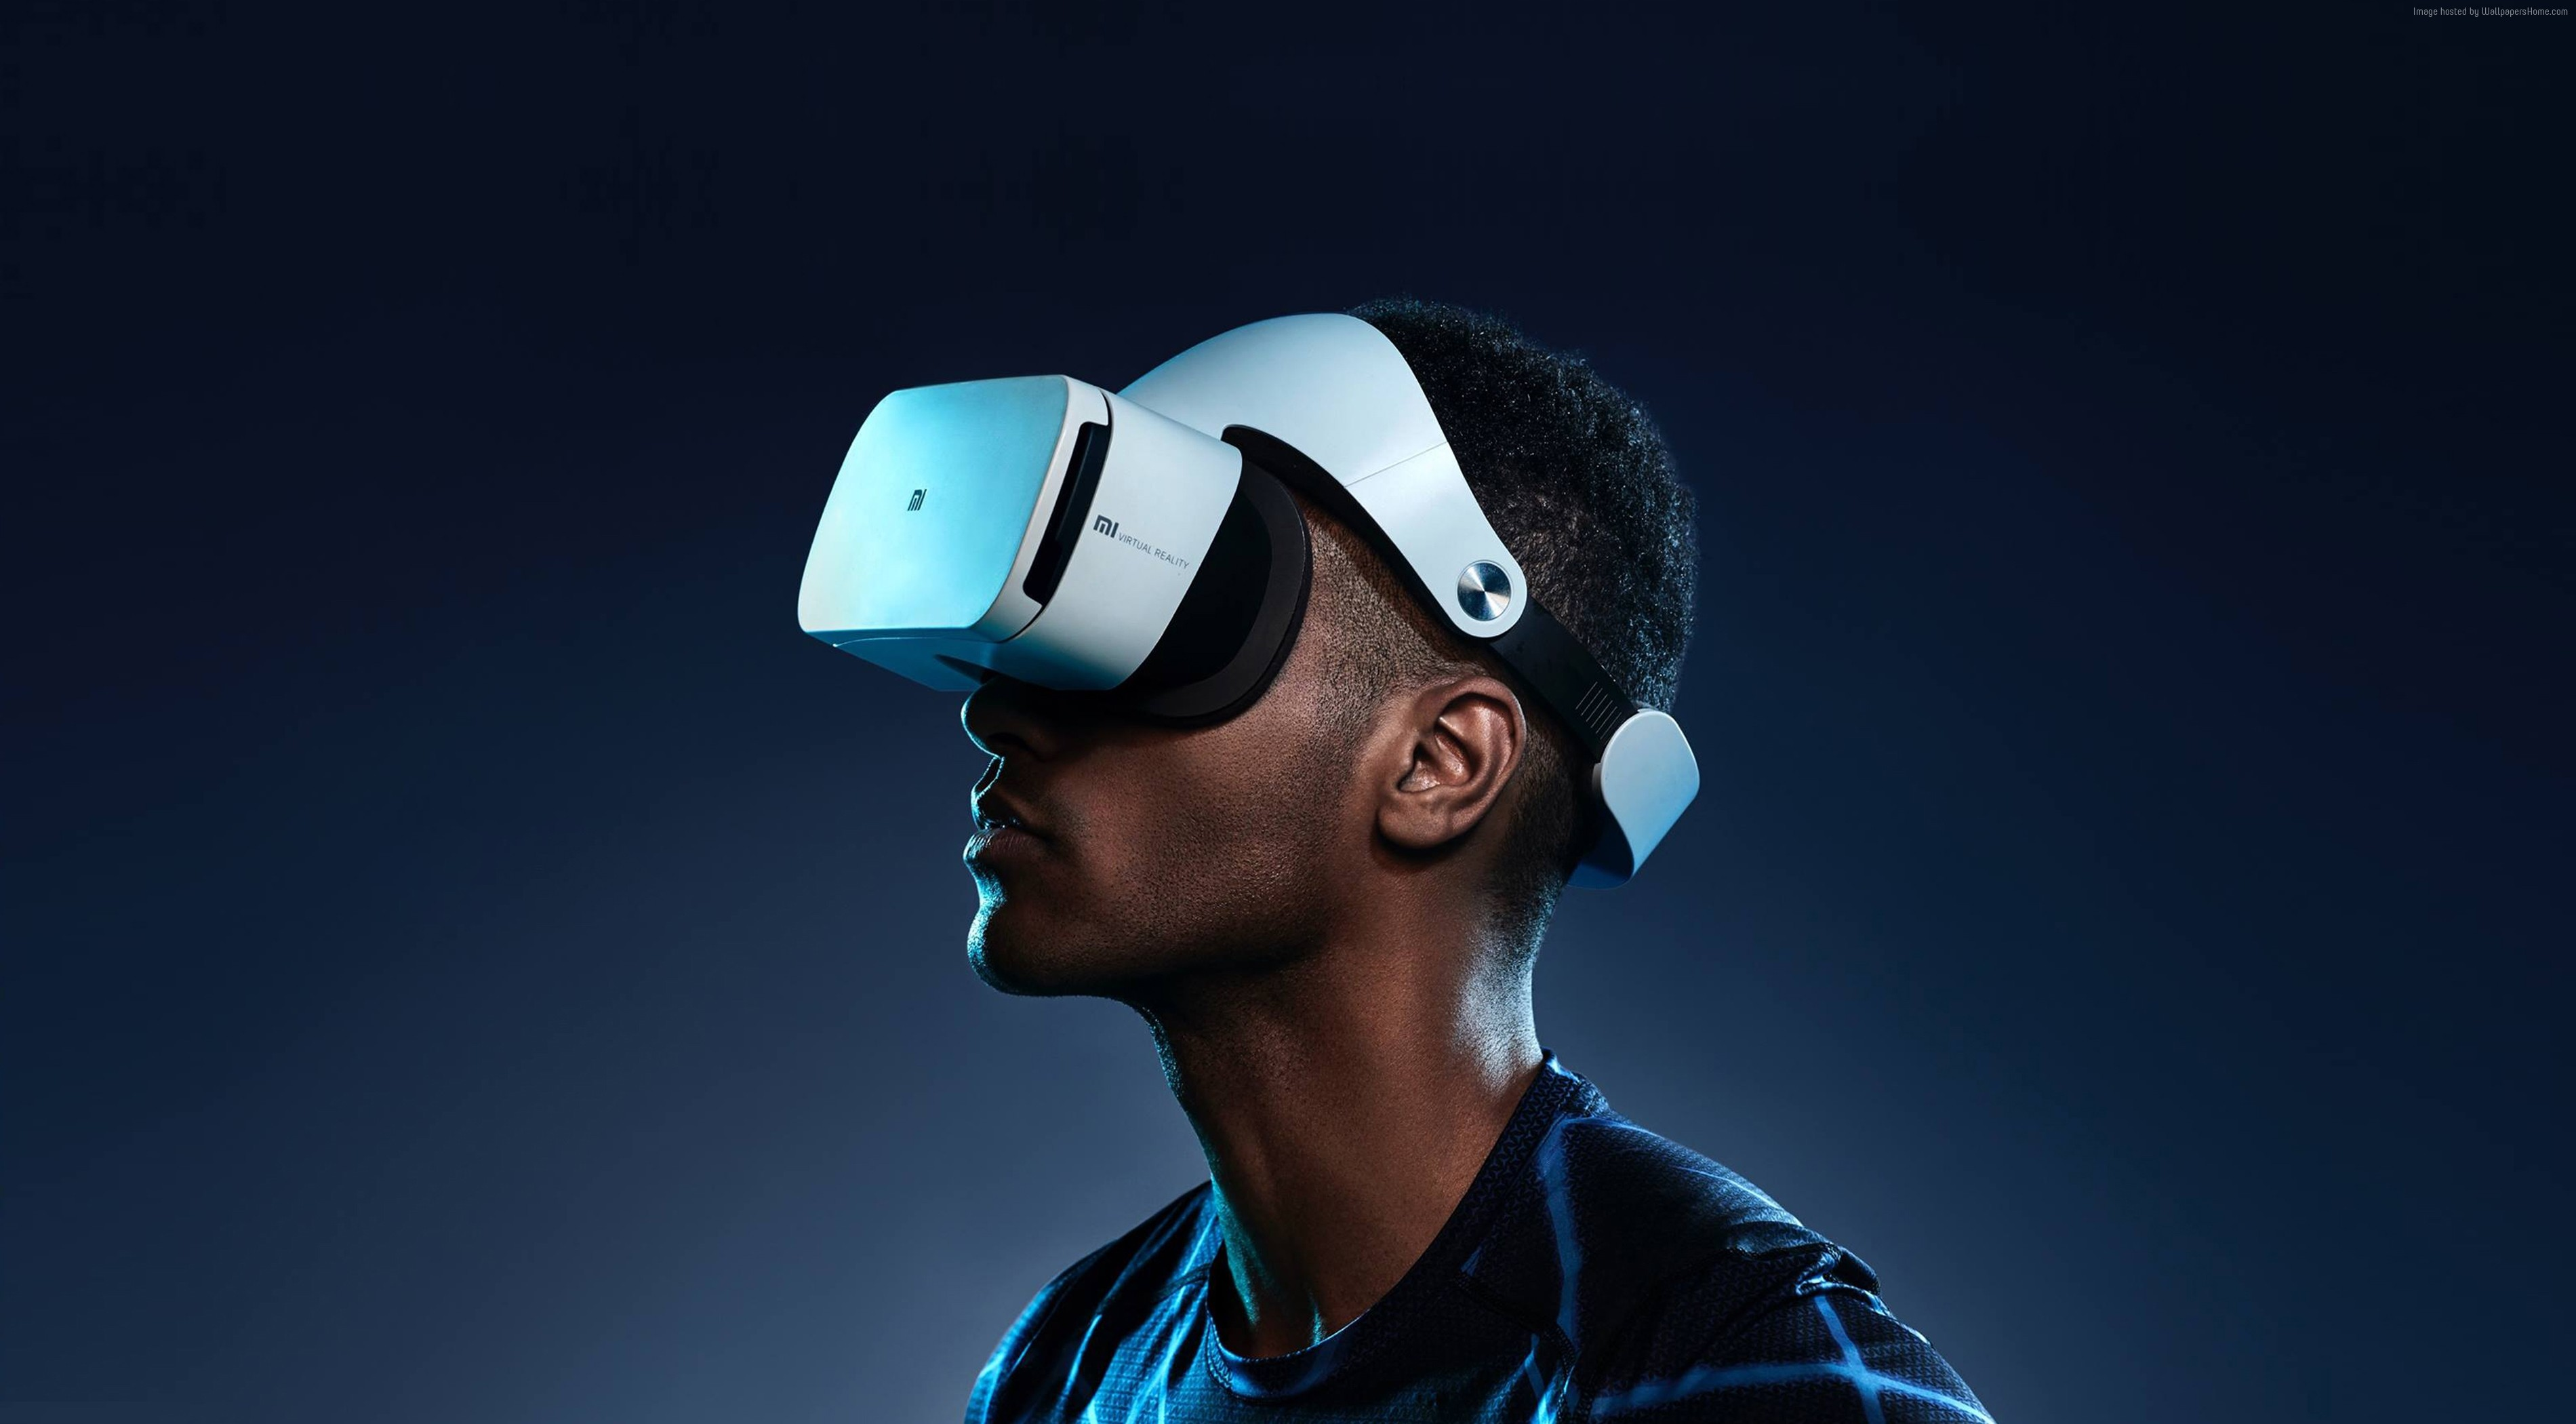 VR MI VR Virtual Reality VR headset Xiaomi 3800x2100